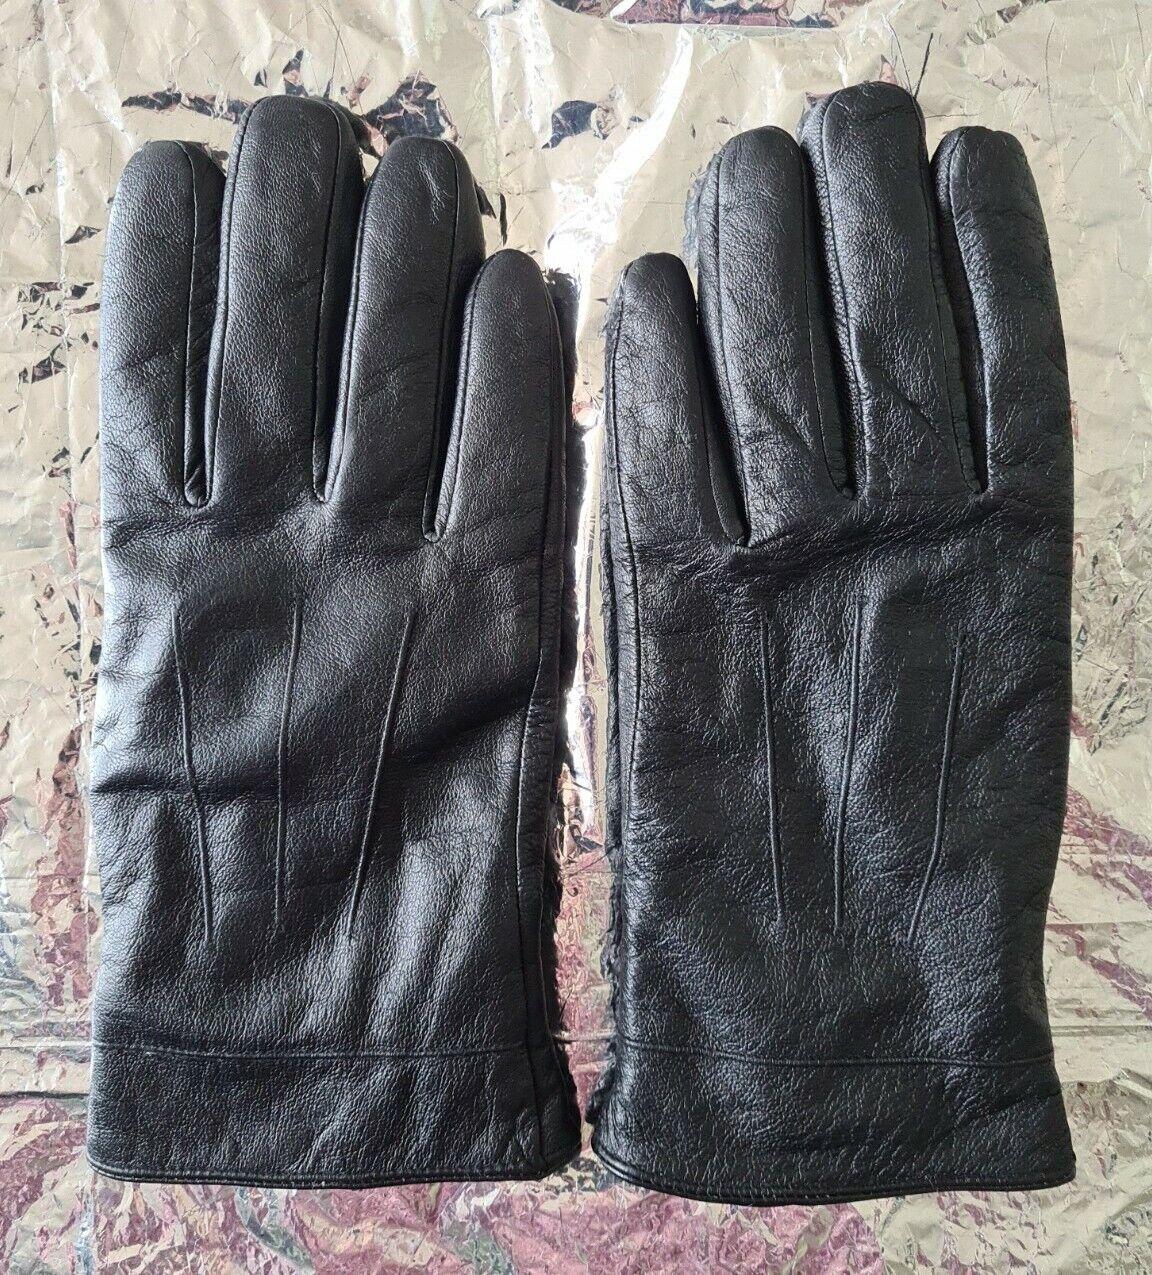 Birreti GLOVES Black Leather Size 12